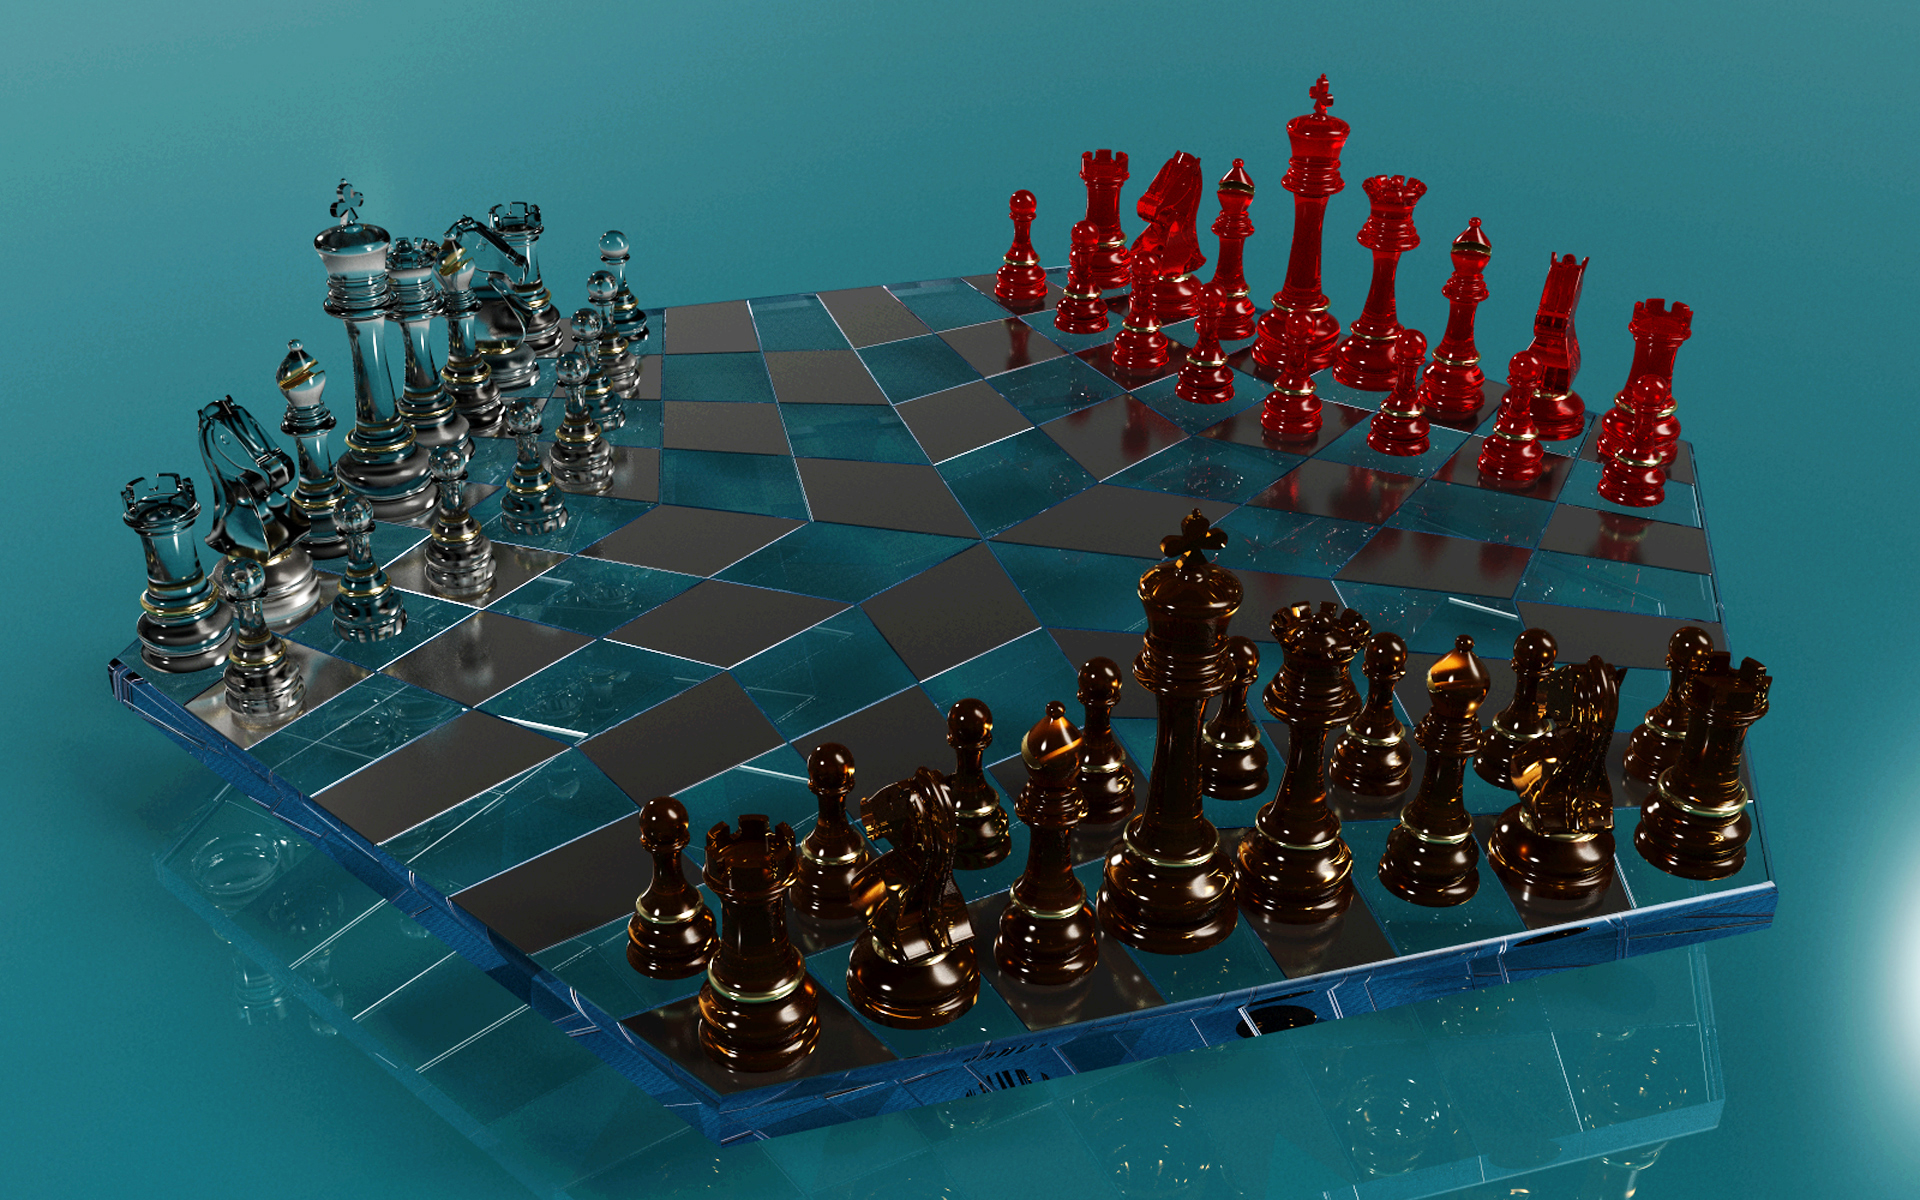 wallpaper_chess-for-three_c_1920x1200.jpg